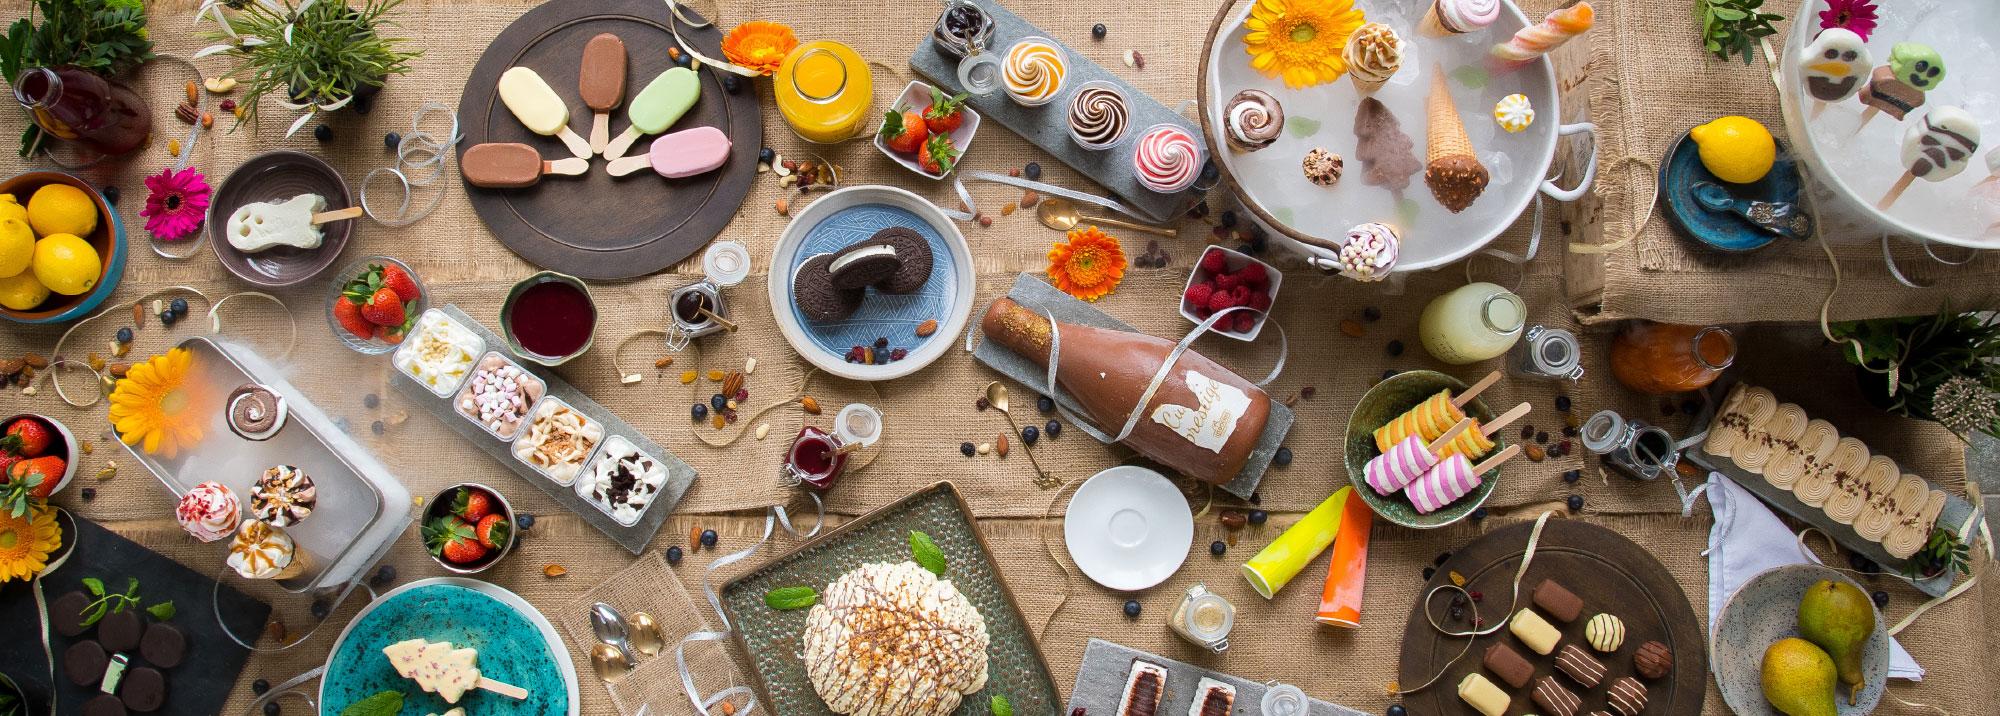 Icefresh Foods | Own Label Ice Cream & Desserts Experts